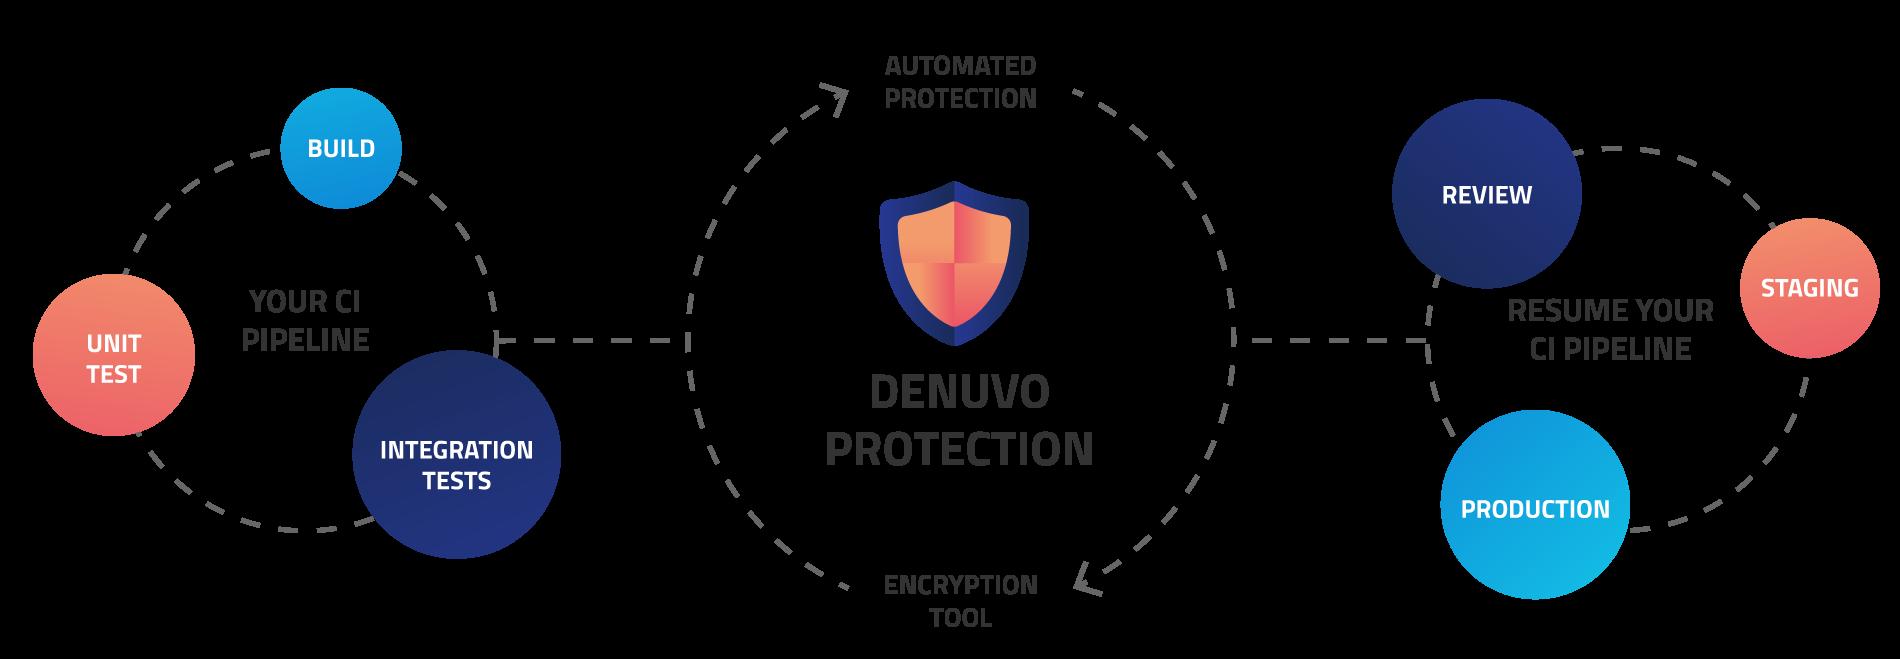 Denuvo protection integration diagram